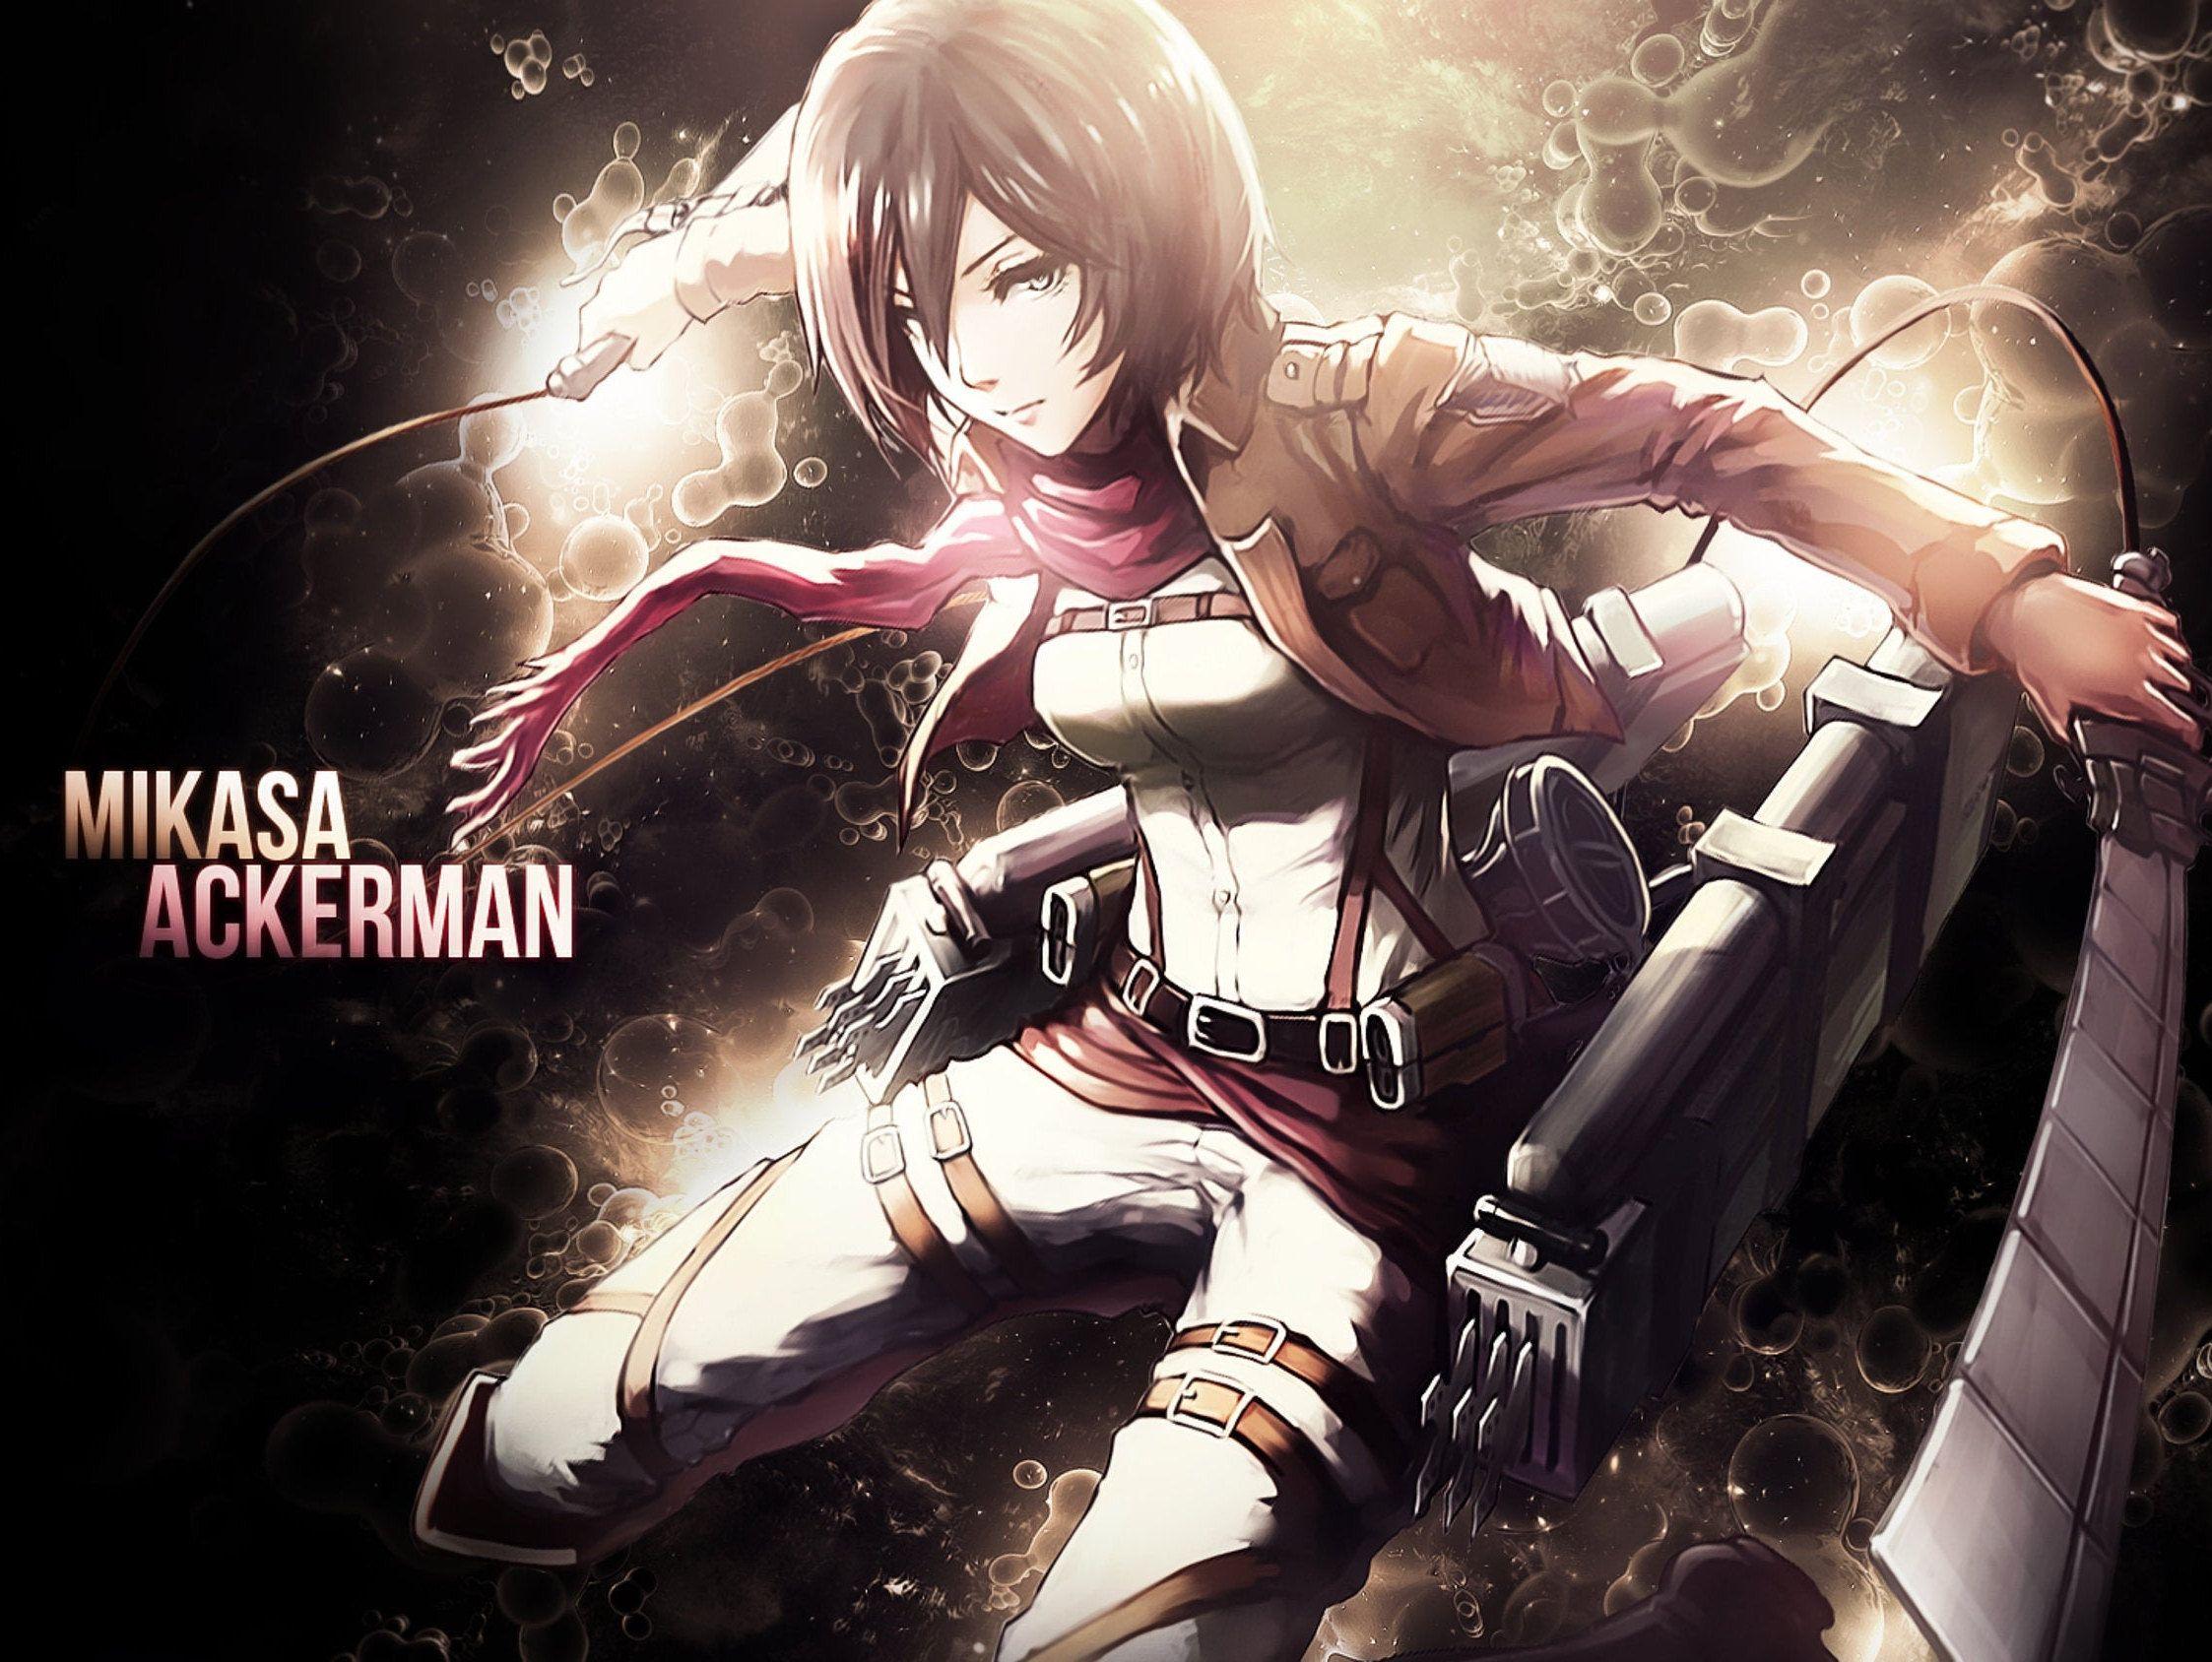 Mikasa Ackerman Aot Digital Print Download Anime Attack On Titan Poster Shingeki No Kyojin Wallpaper By Digitalanimeprints On Et In 2021 Attack On Titan Anime Mikasa